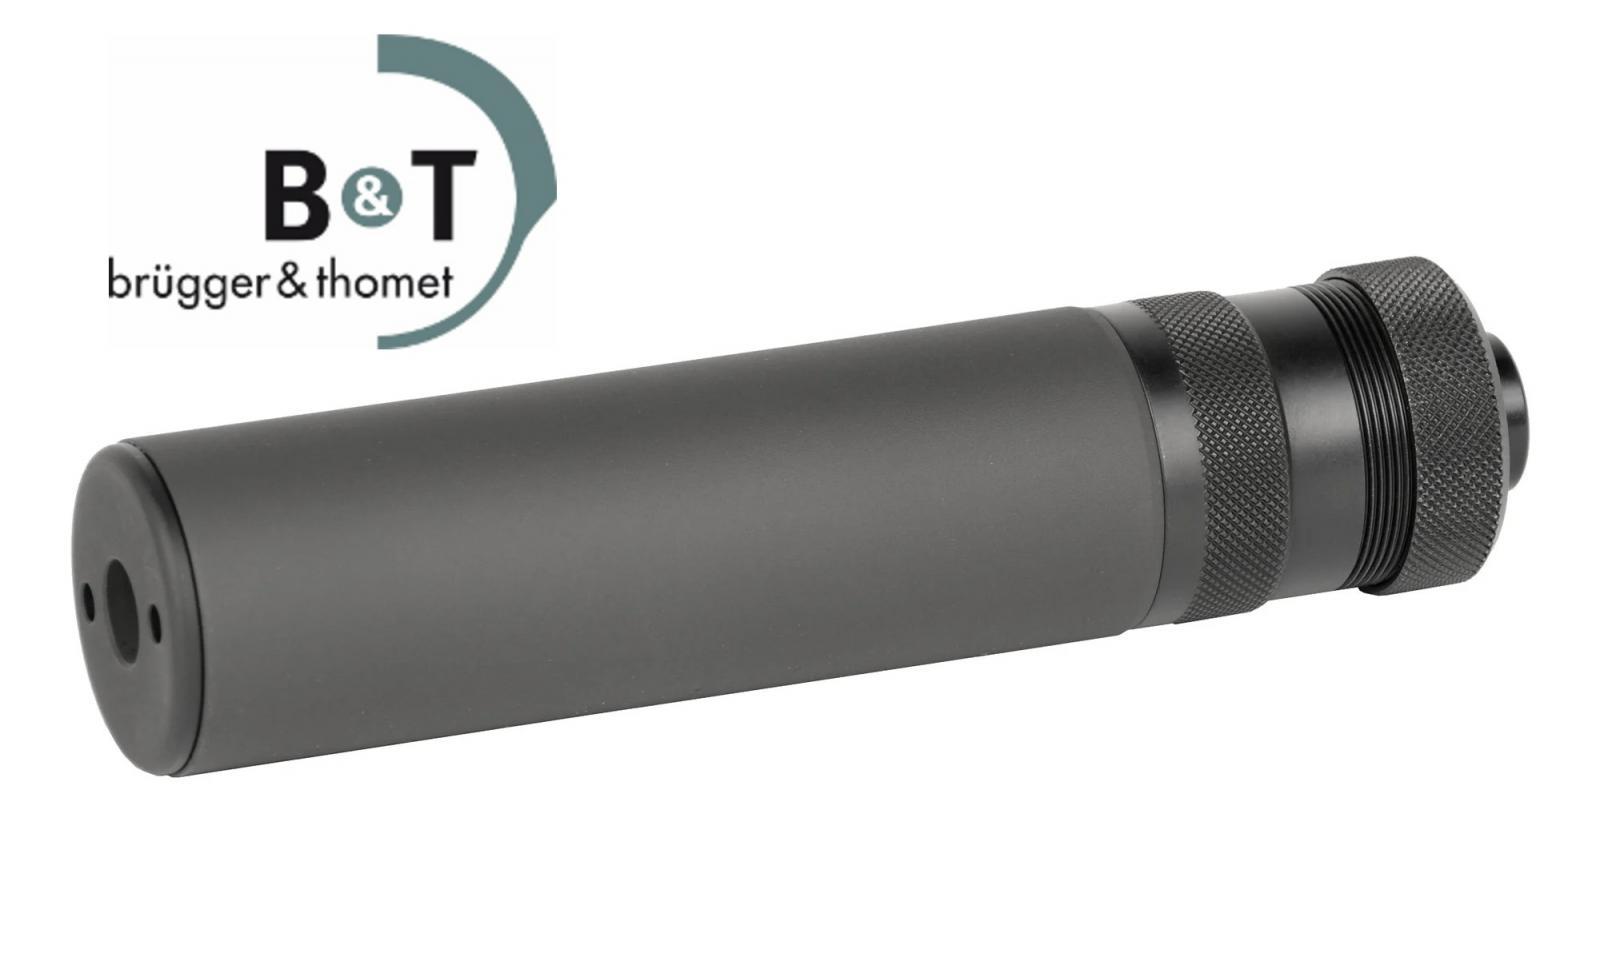 Silencieux BRUGGER & THOMET IMPULS-IIA COMPACT  pour Glock Cal 9mm